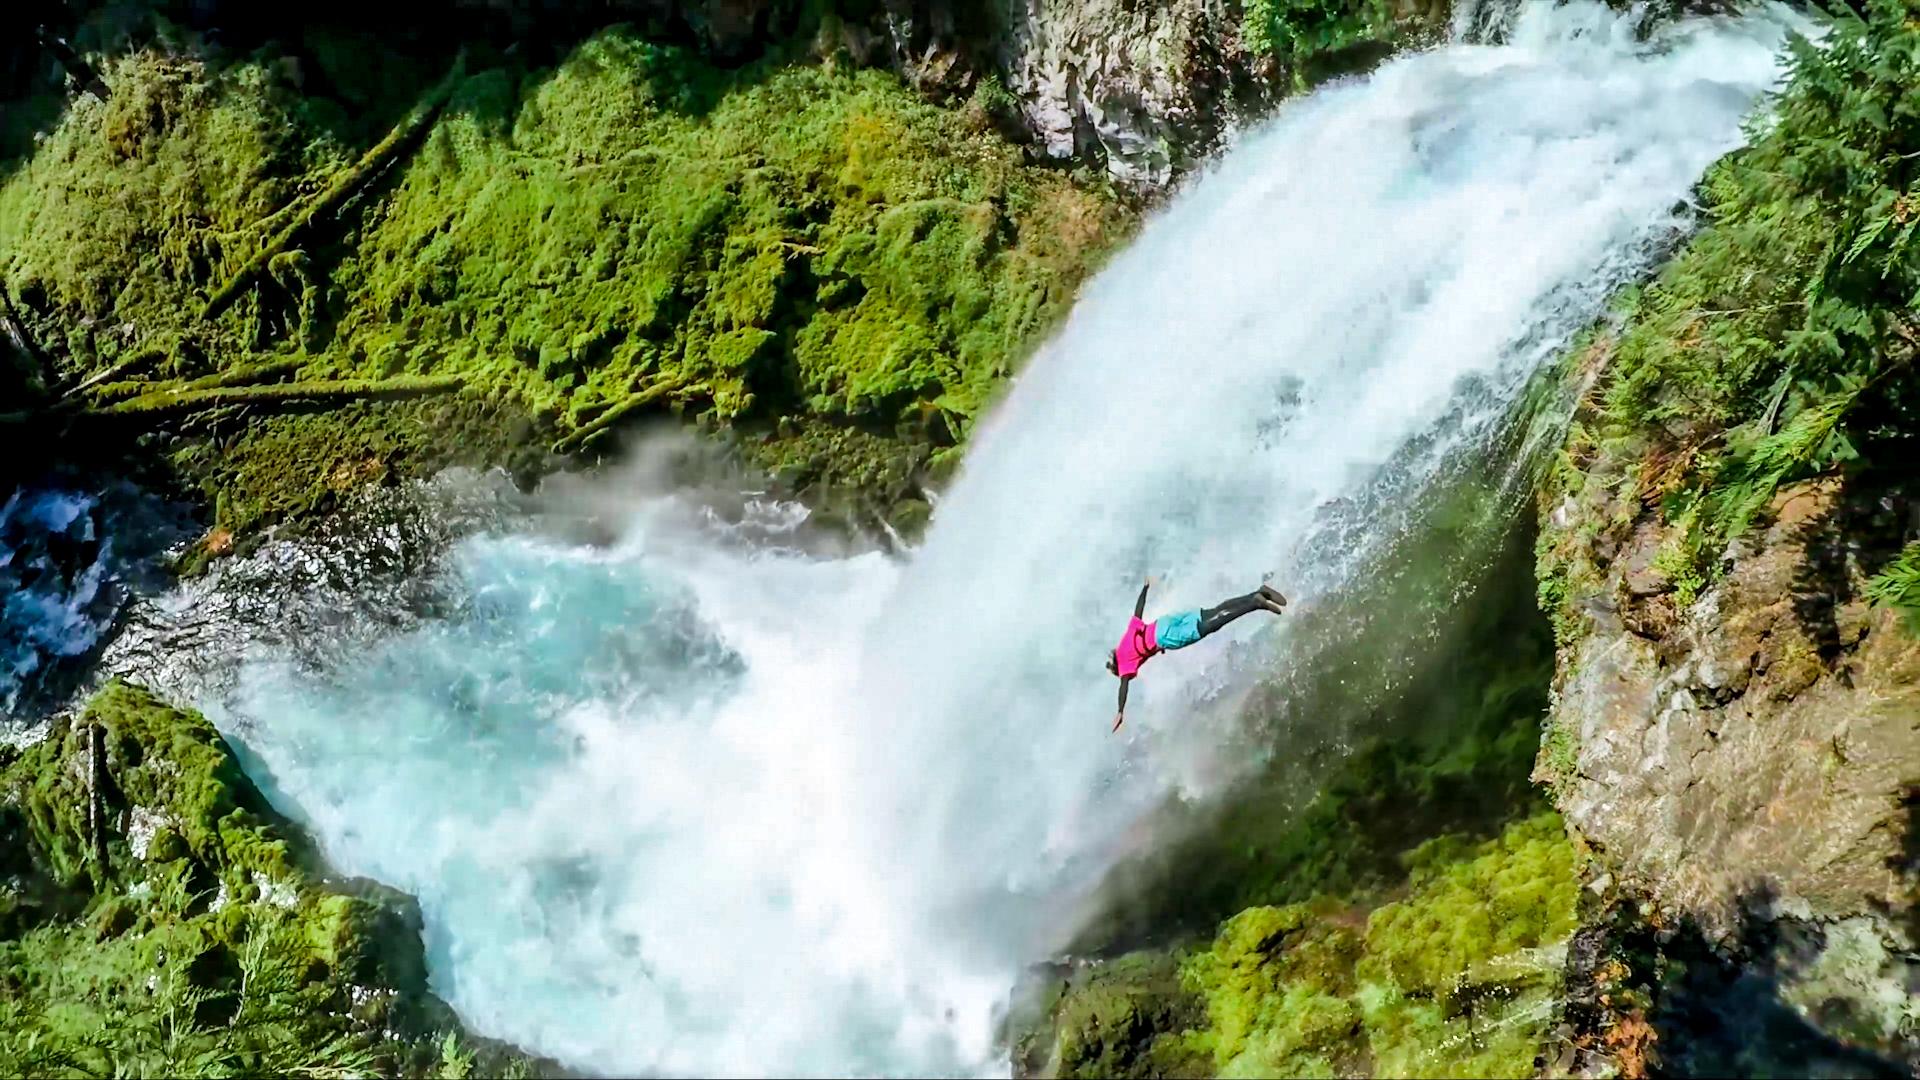 Adrenaline Addiction: Social Videos